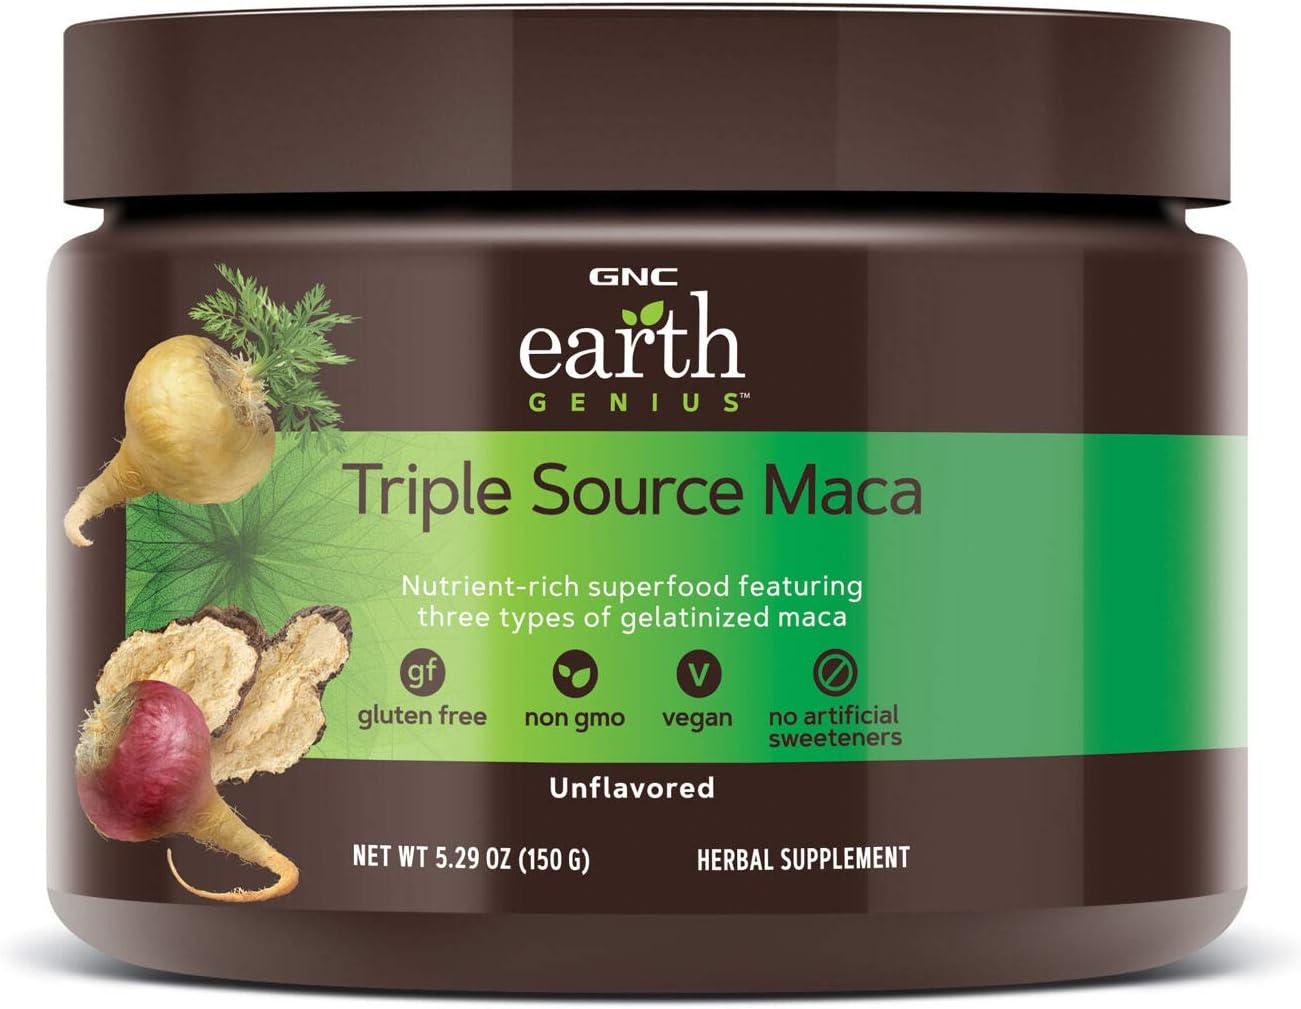 GNC Earth Genius Triple Source Maca - Unflavored, 30 Servings, Nutrient-Rich Superfood